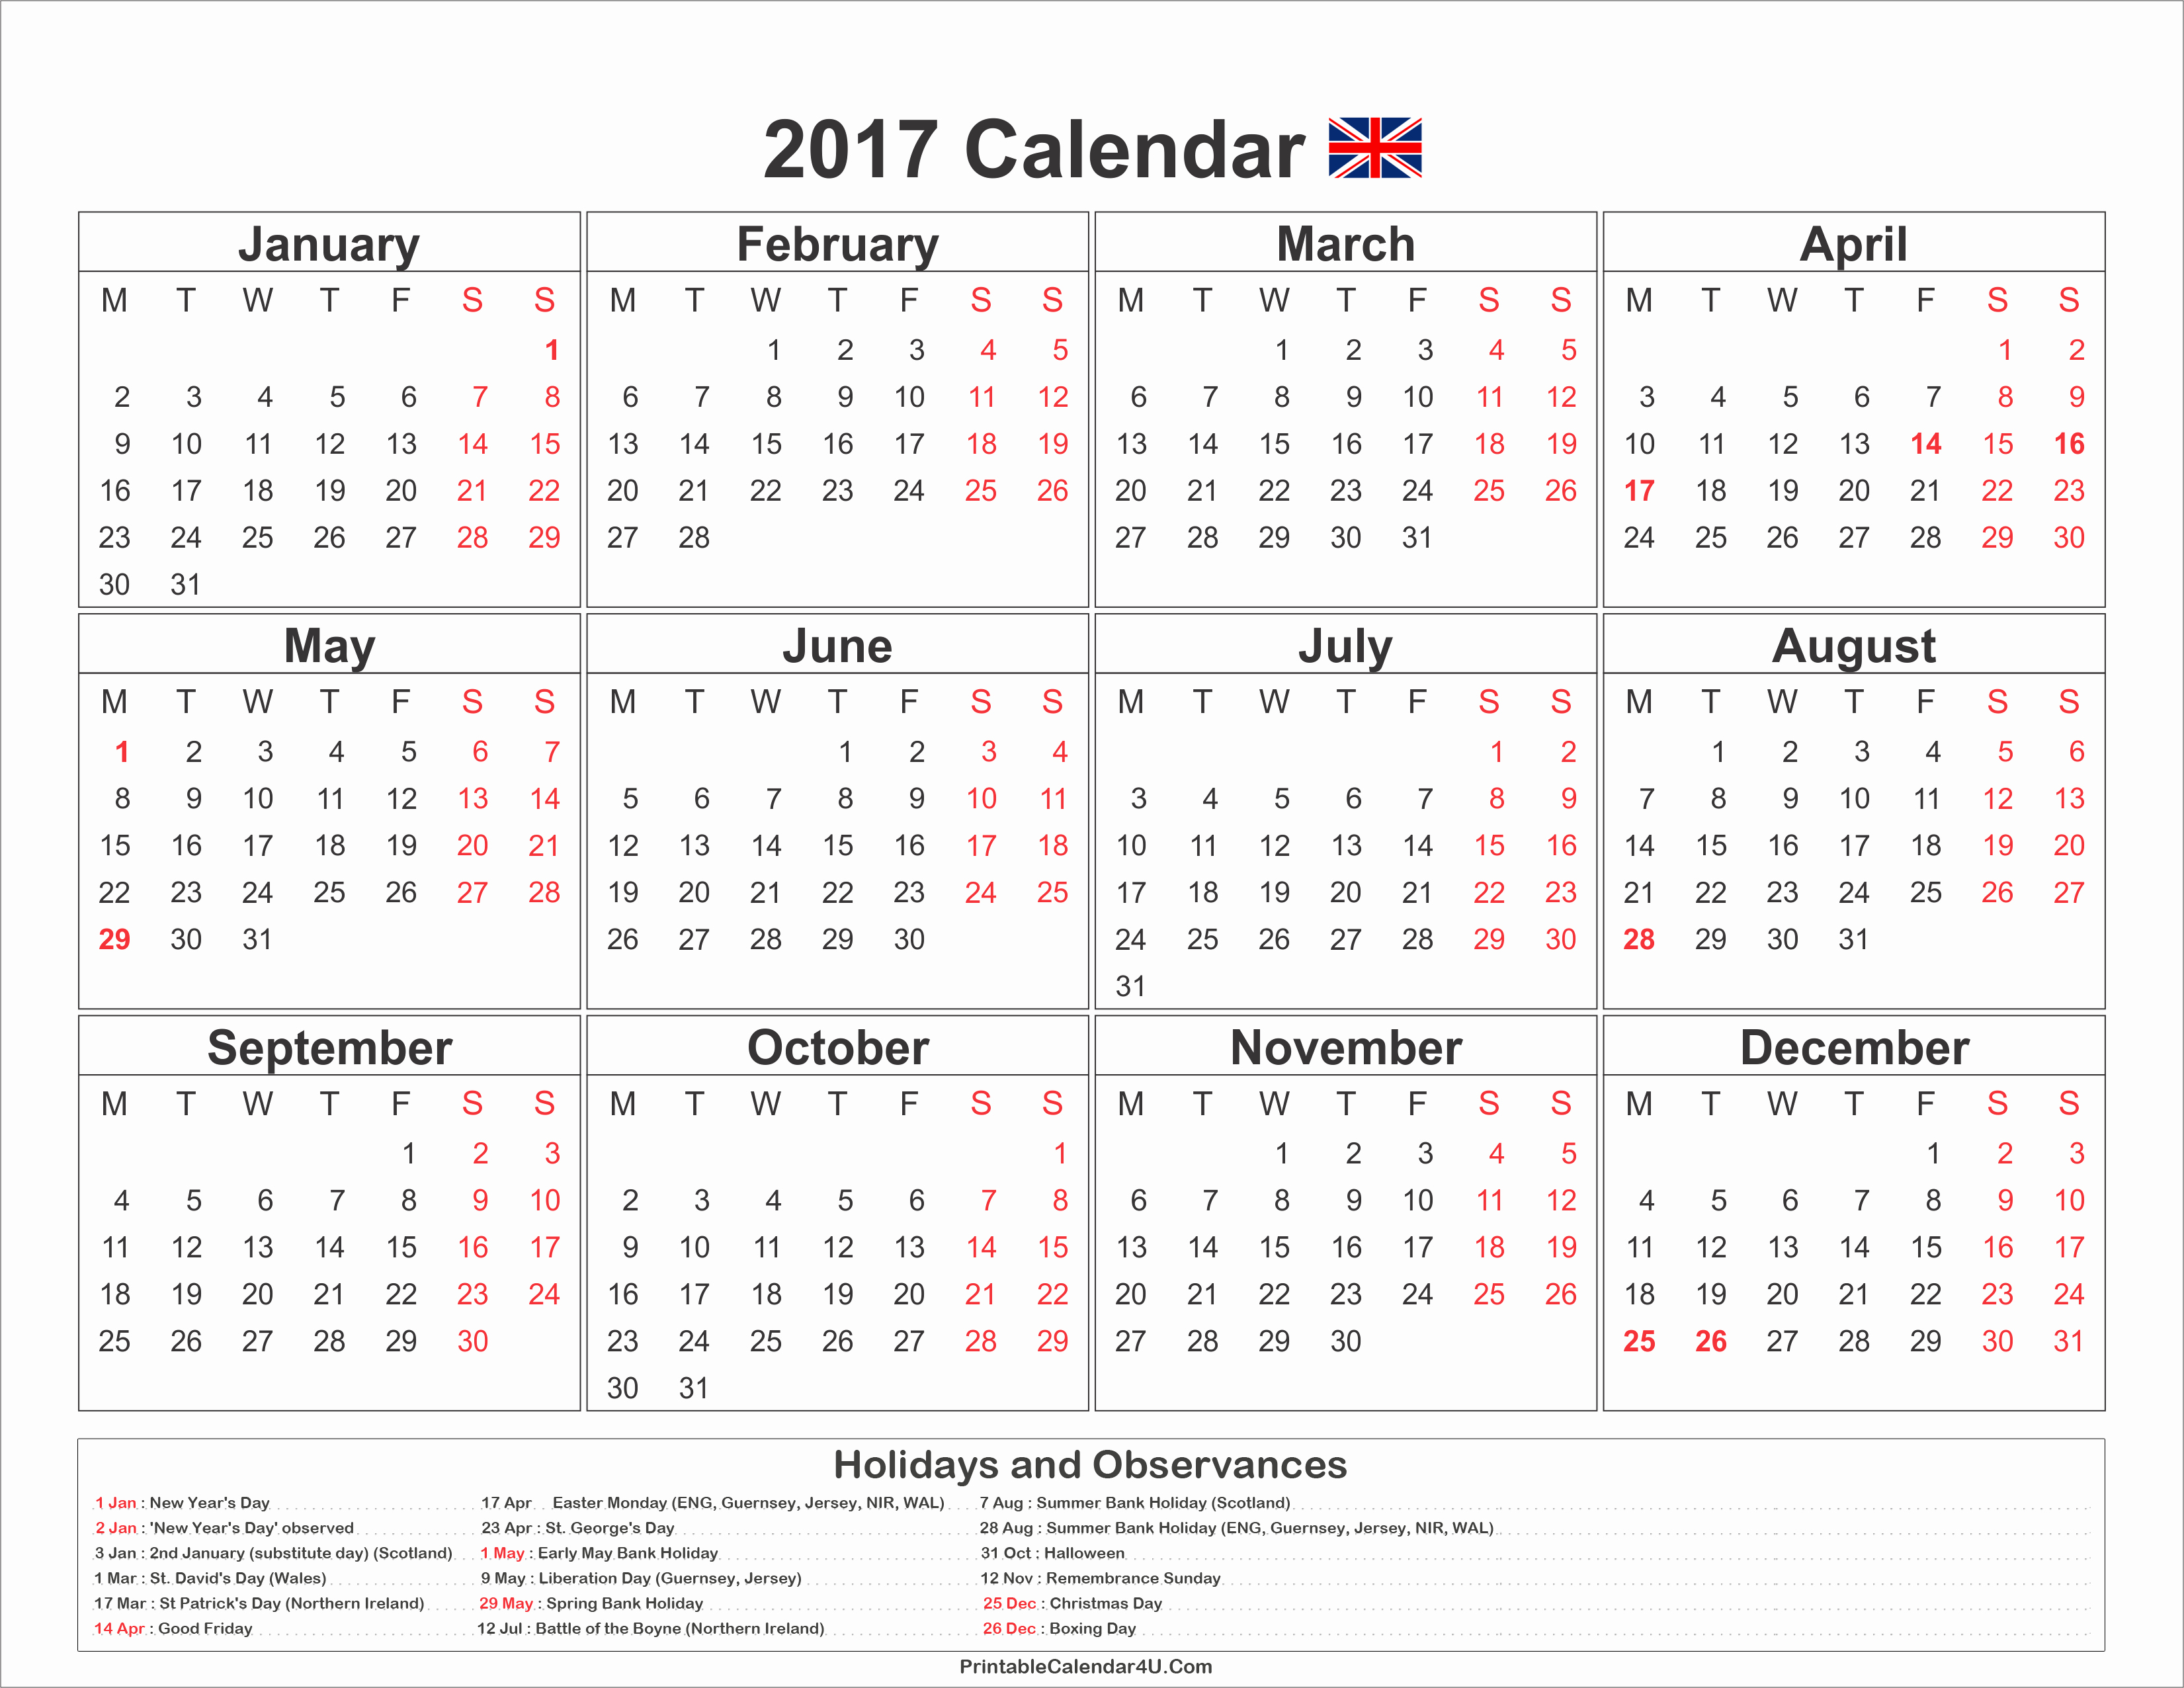 2017 Editable Calendar with Holidays Awesome 2017 Calendar Uk with Holidays Free Printable Calendar 2017